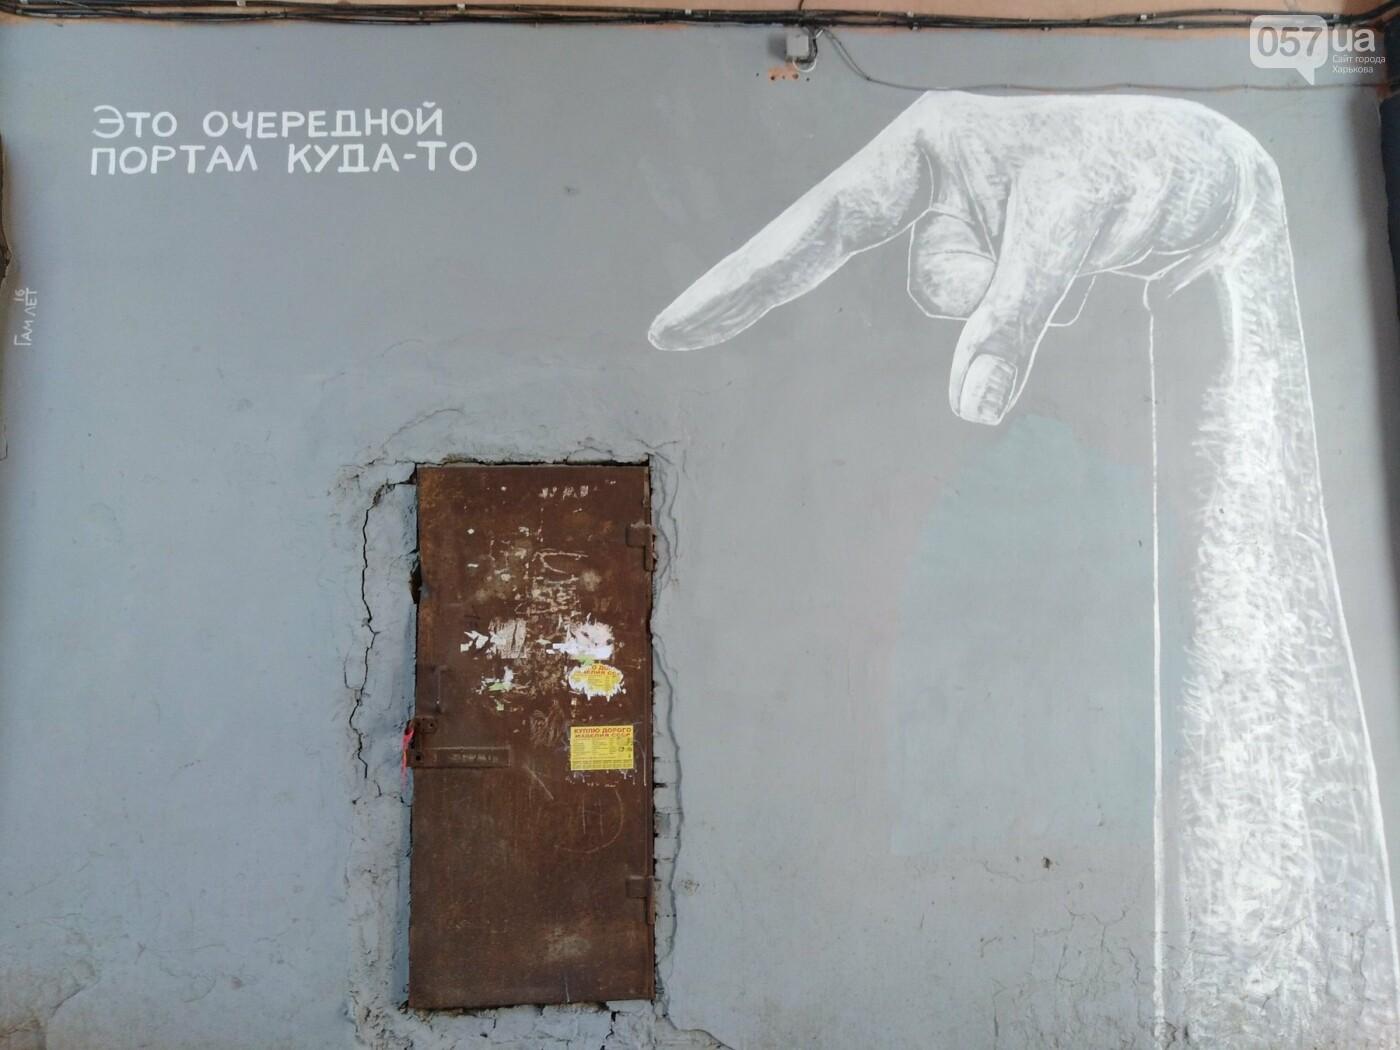 Стрит-арт Гамлета в Харькове: ТОП-10 граффити художника, - ФОТО, фото-9